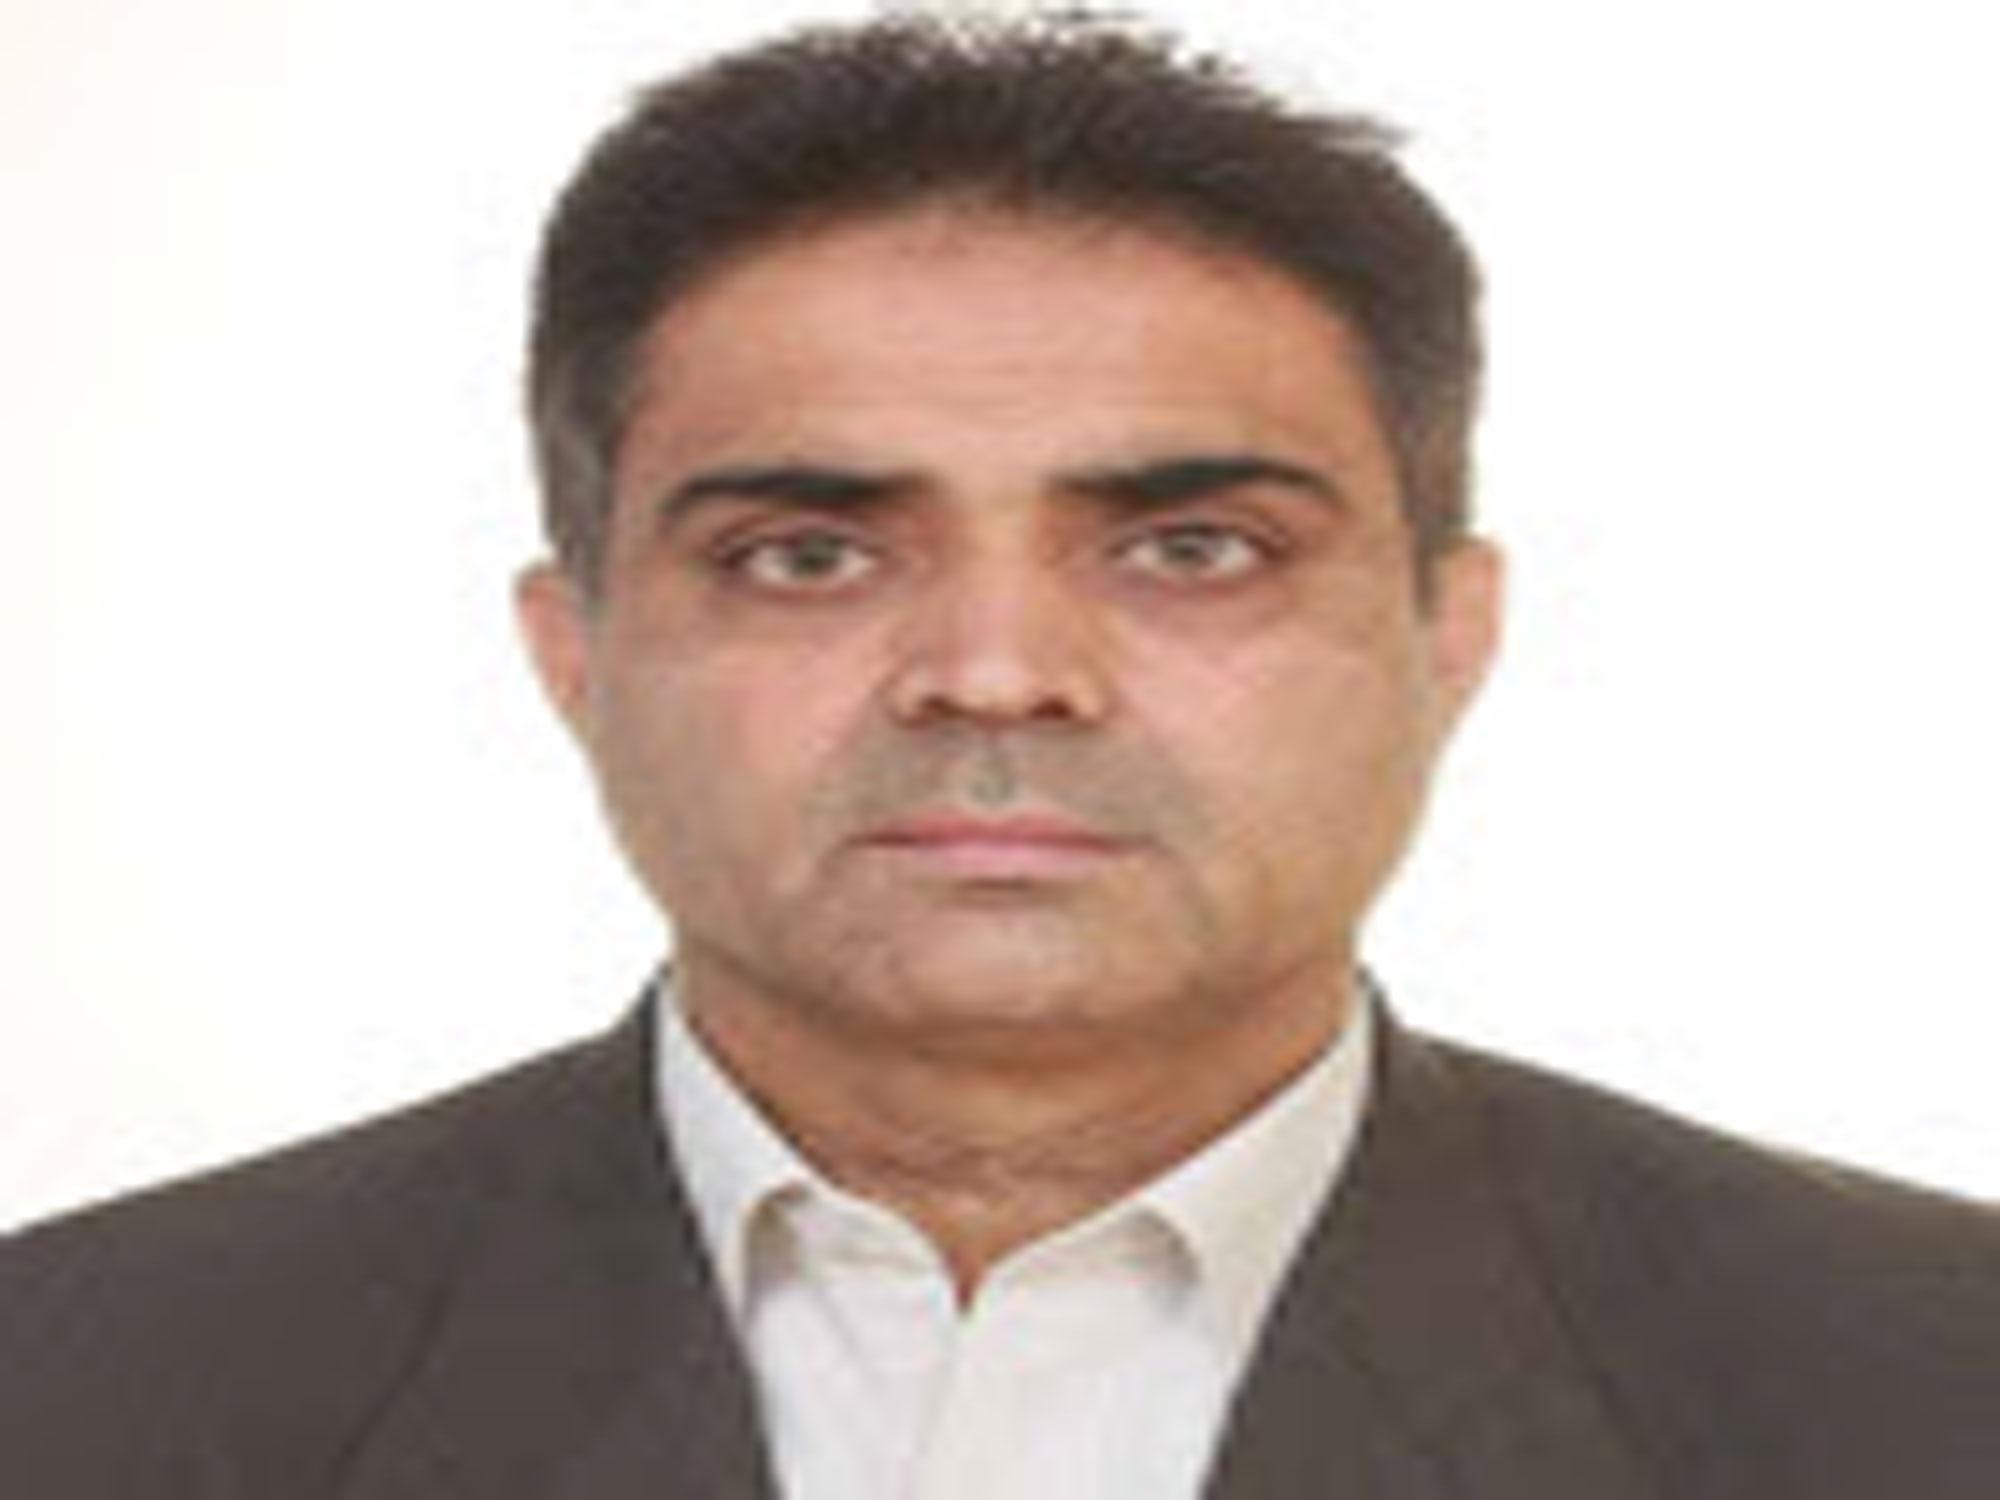 Dr. Farooq Ahmed